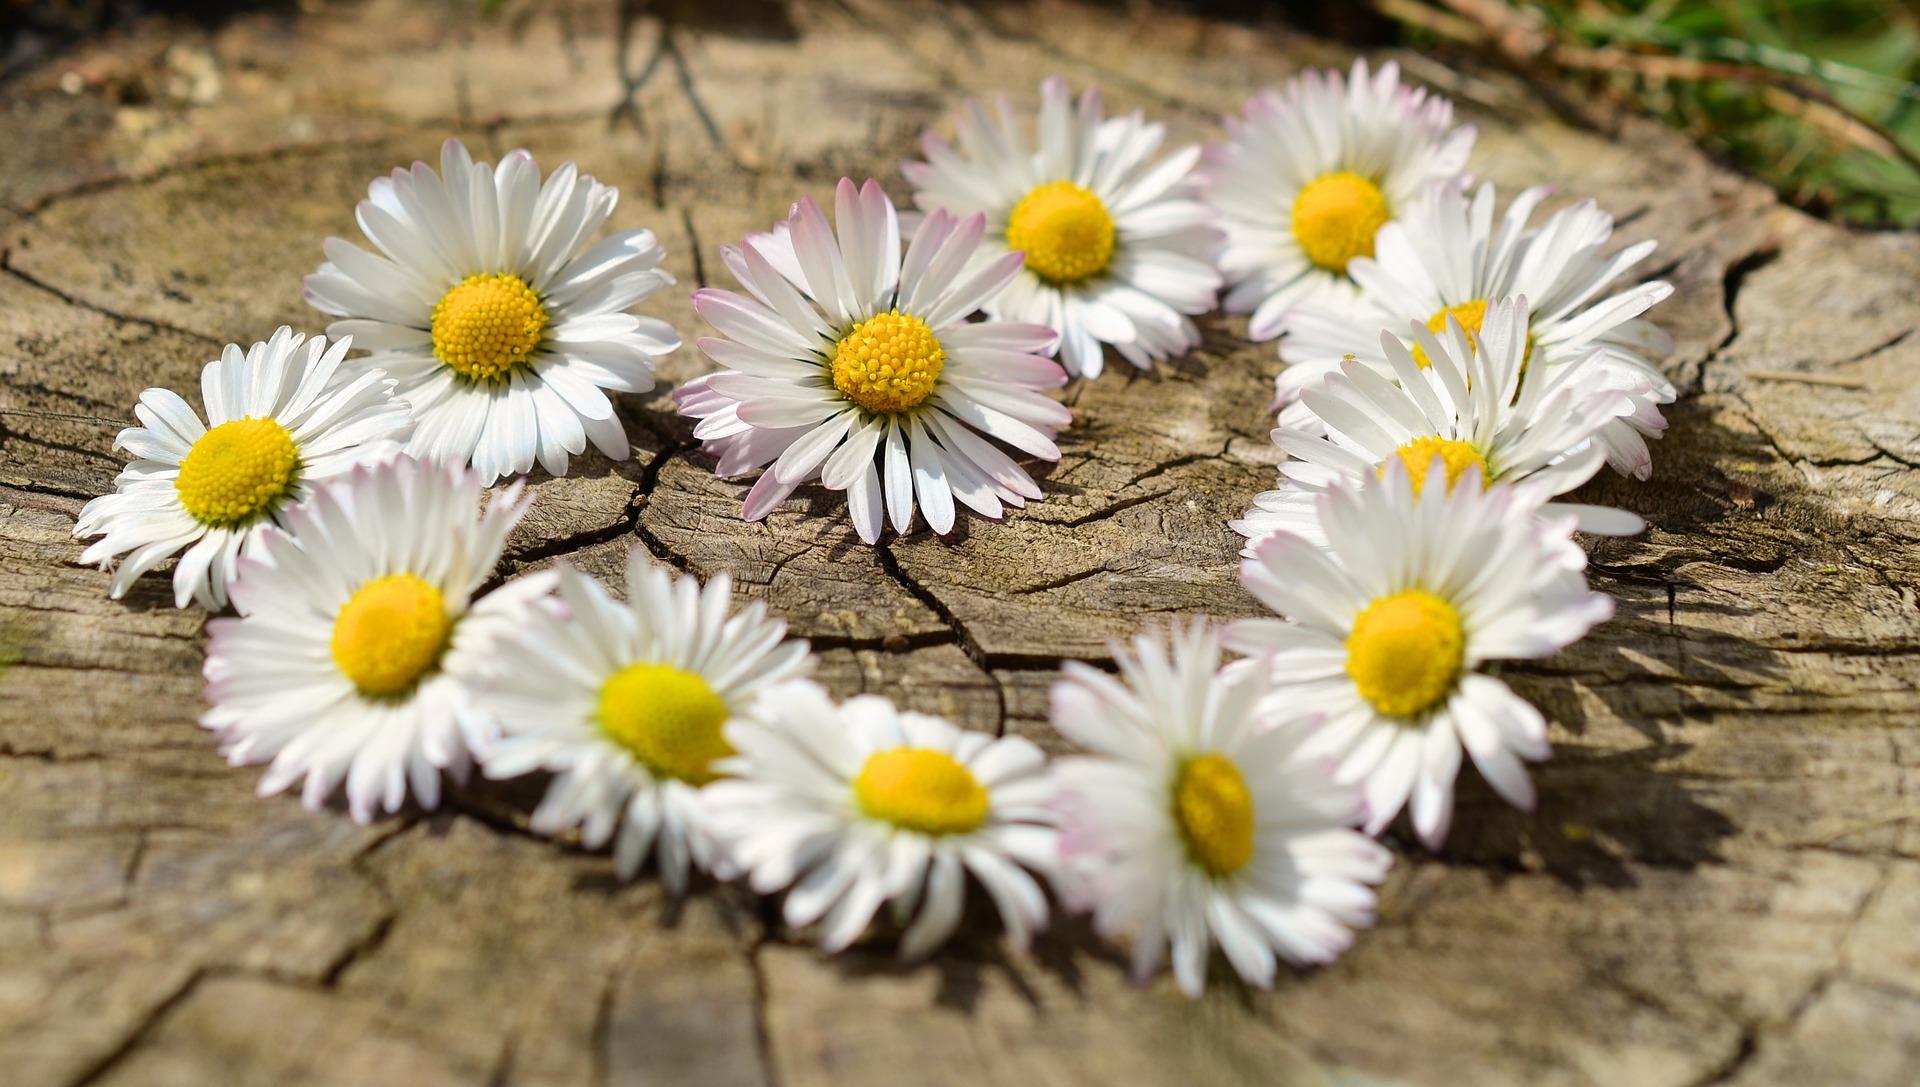 dragoste iubire - sfatulparintilor.ro - pixabay_com